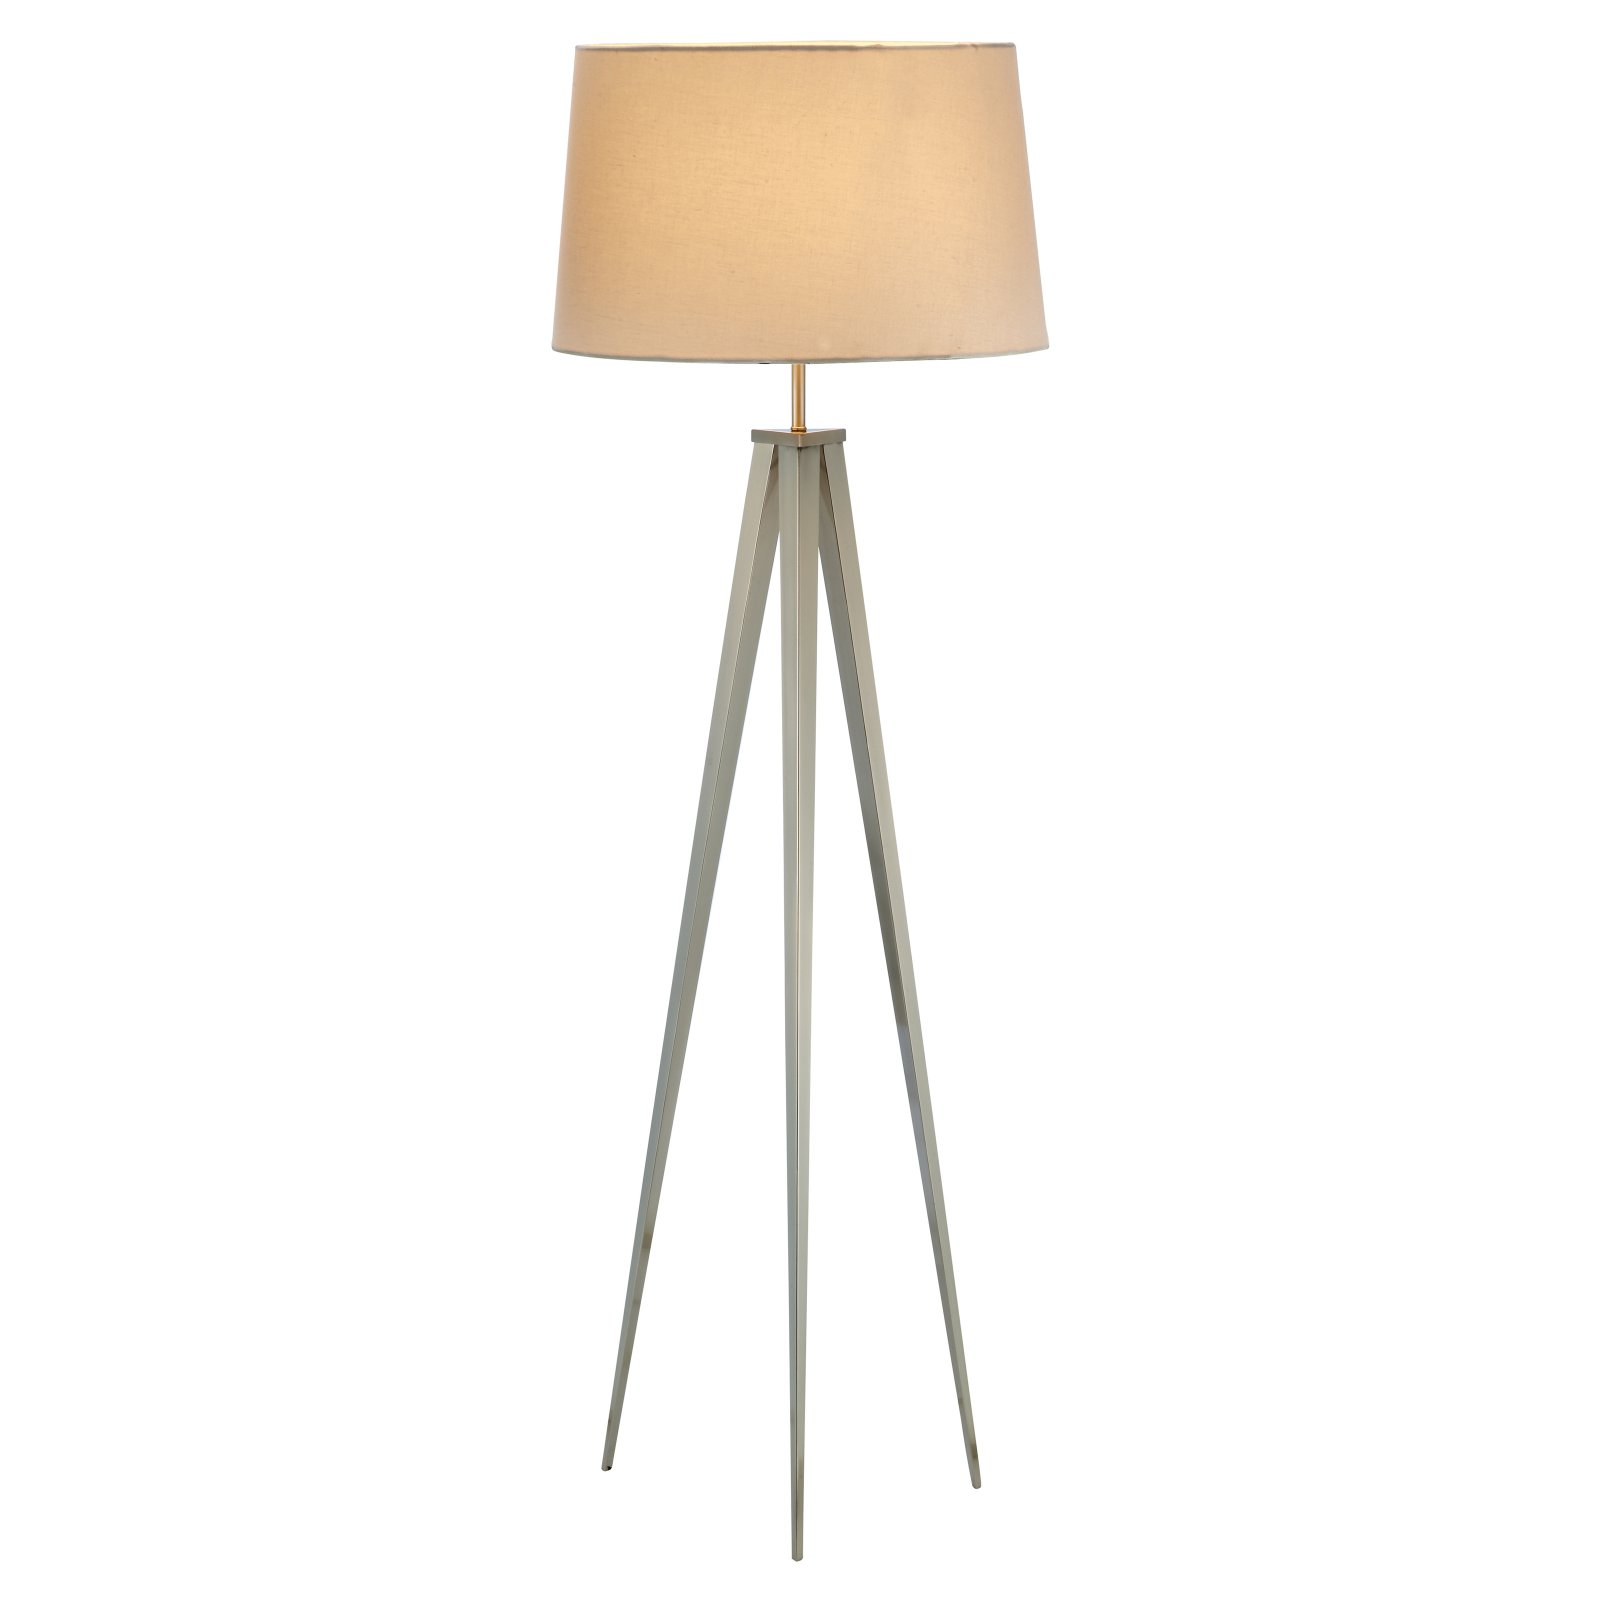 Adesso Producer 3264 Floor Lamp - Satin Steel